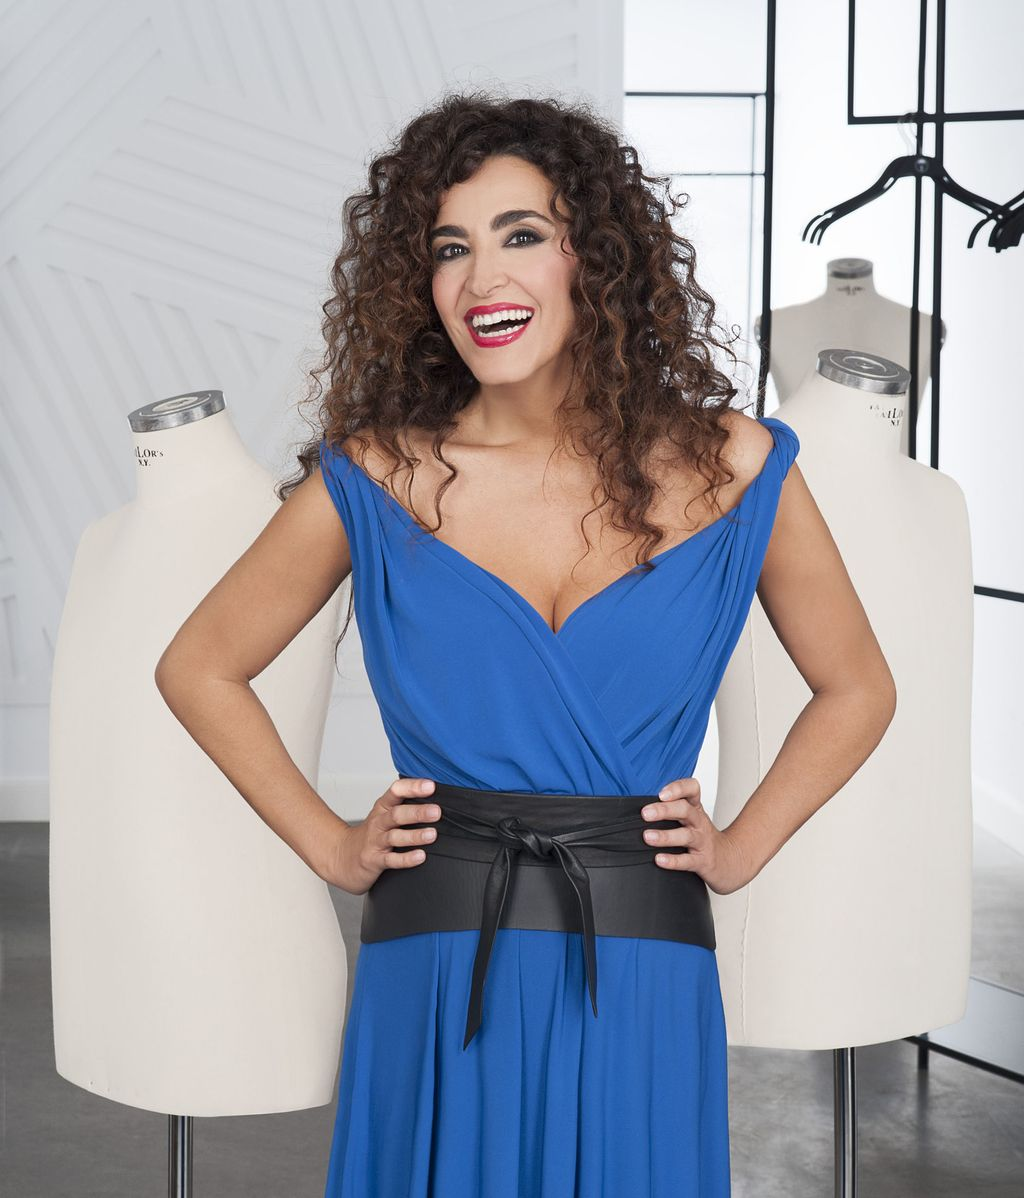 Cristina Rodríguez, 'coach' de 'Cámbiame'